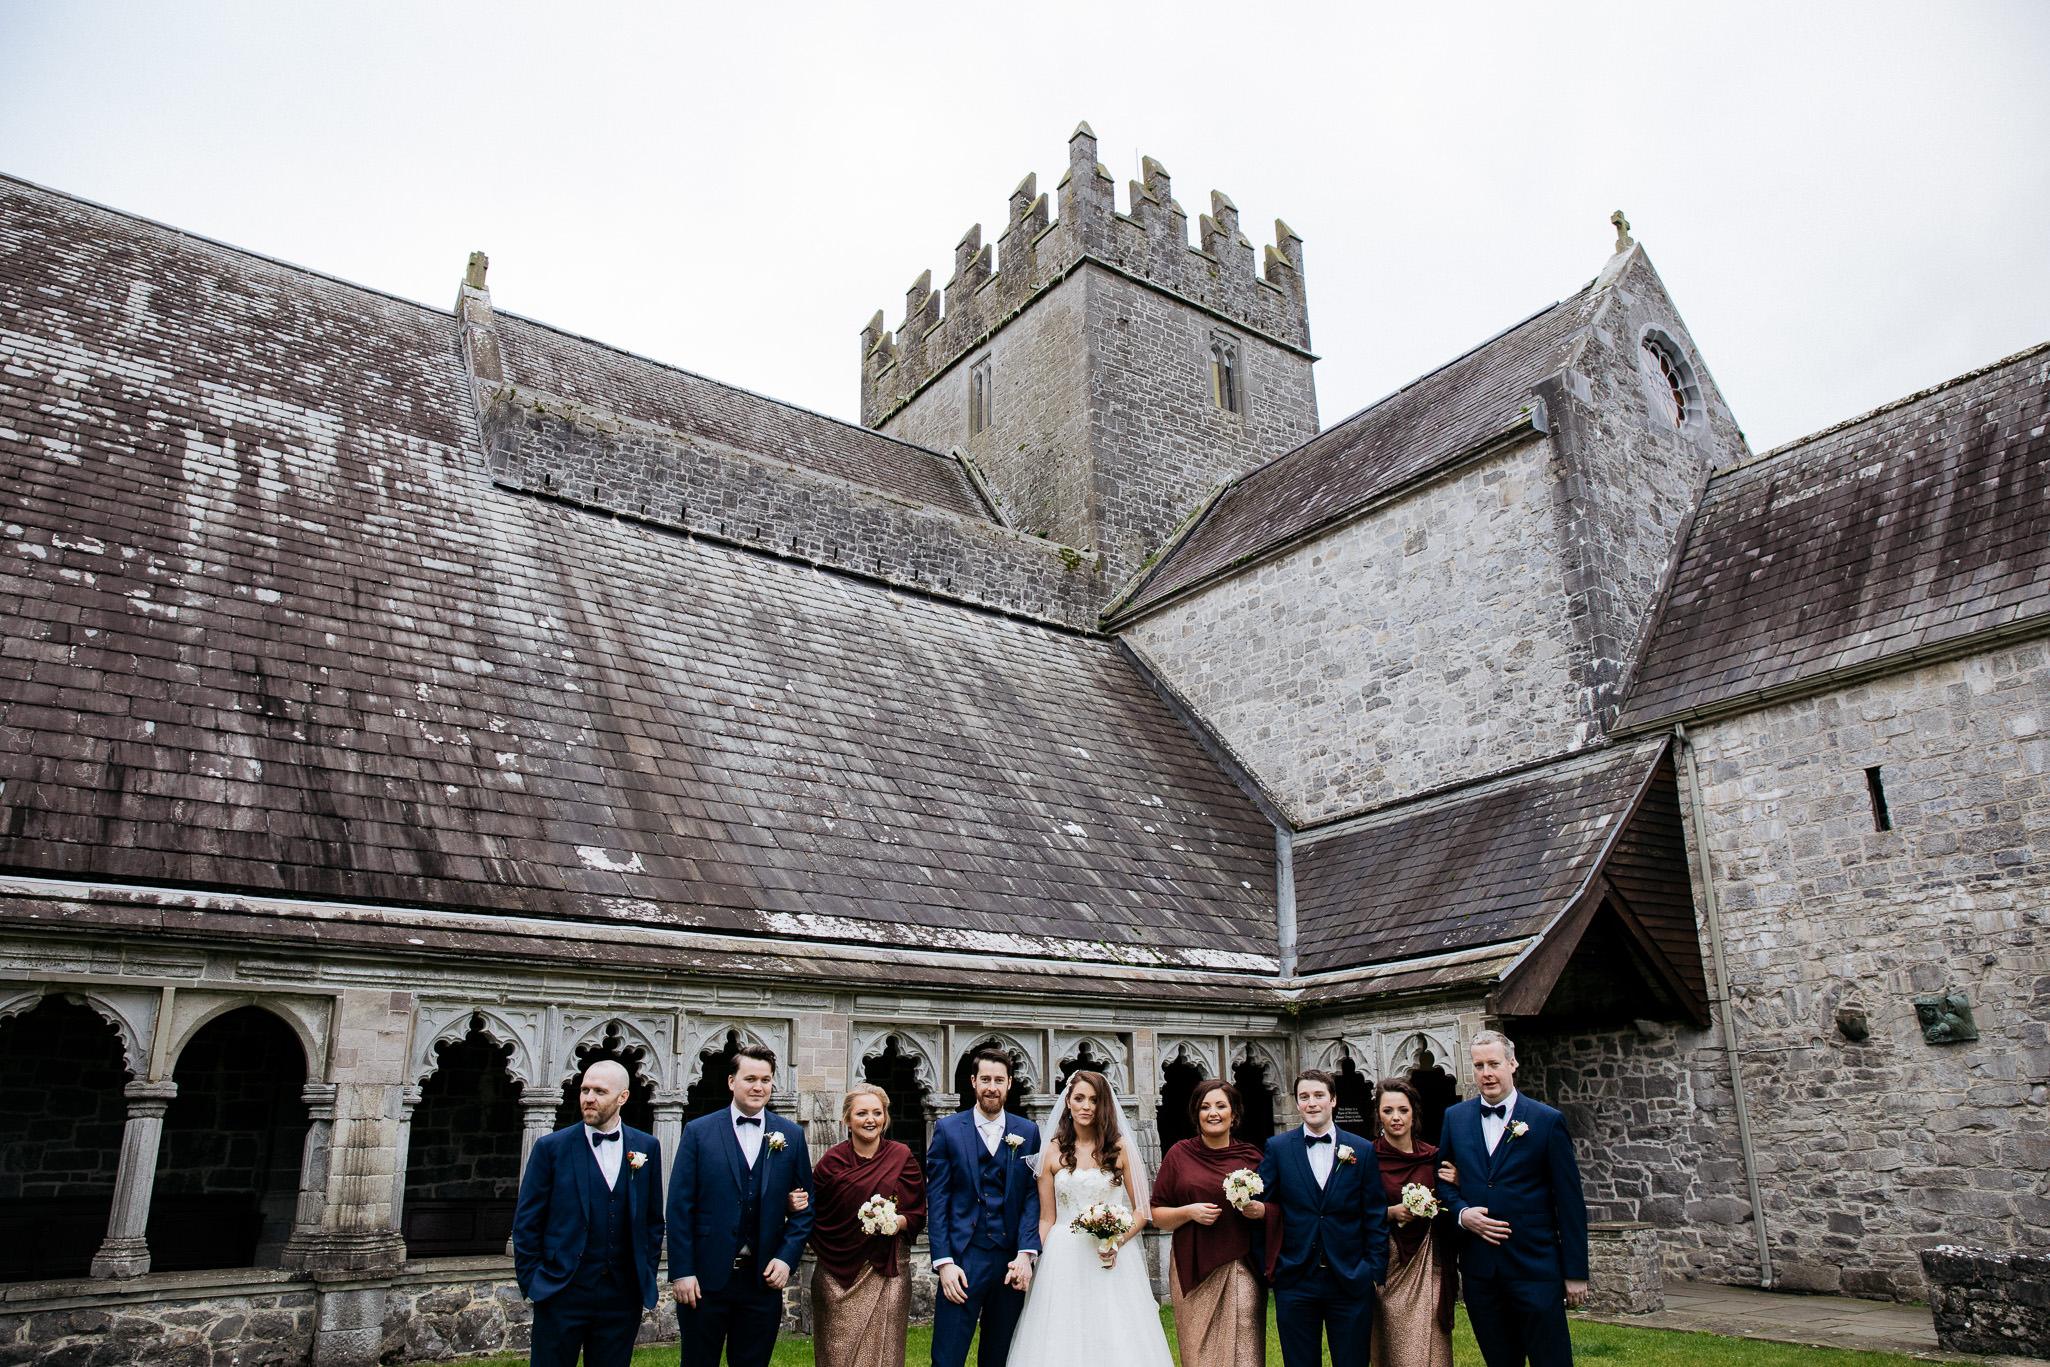 clairebyrnephotography-wedding-night-sparklers-new-years-eve-denyce-leonard-13.jpg